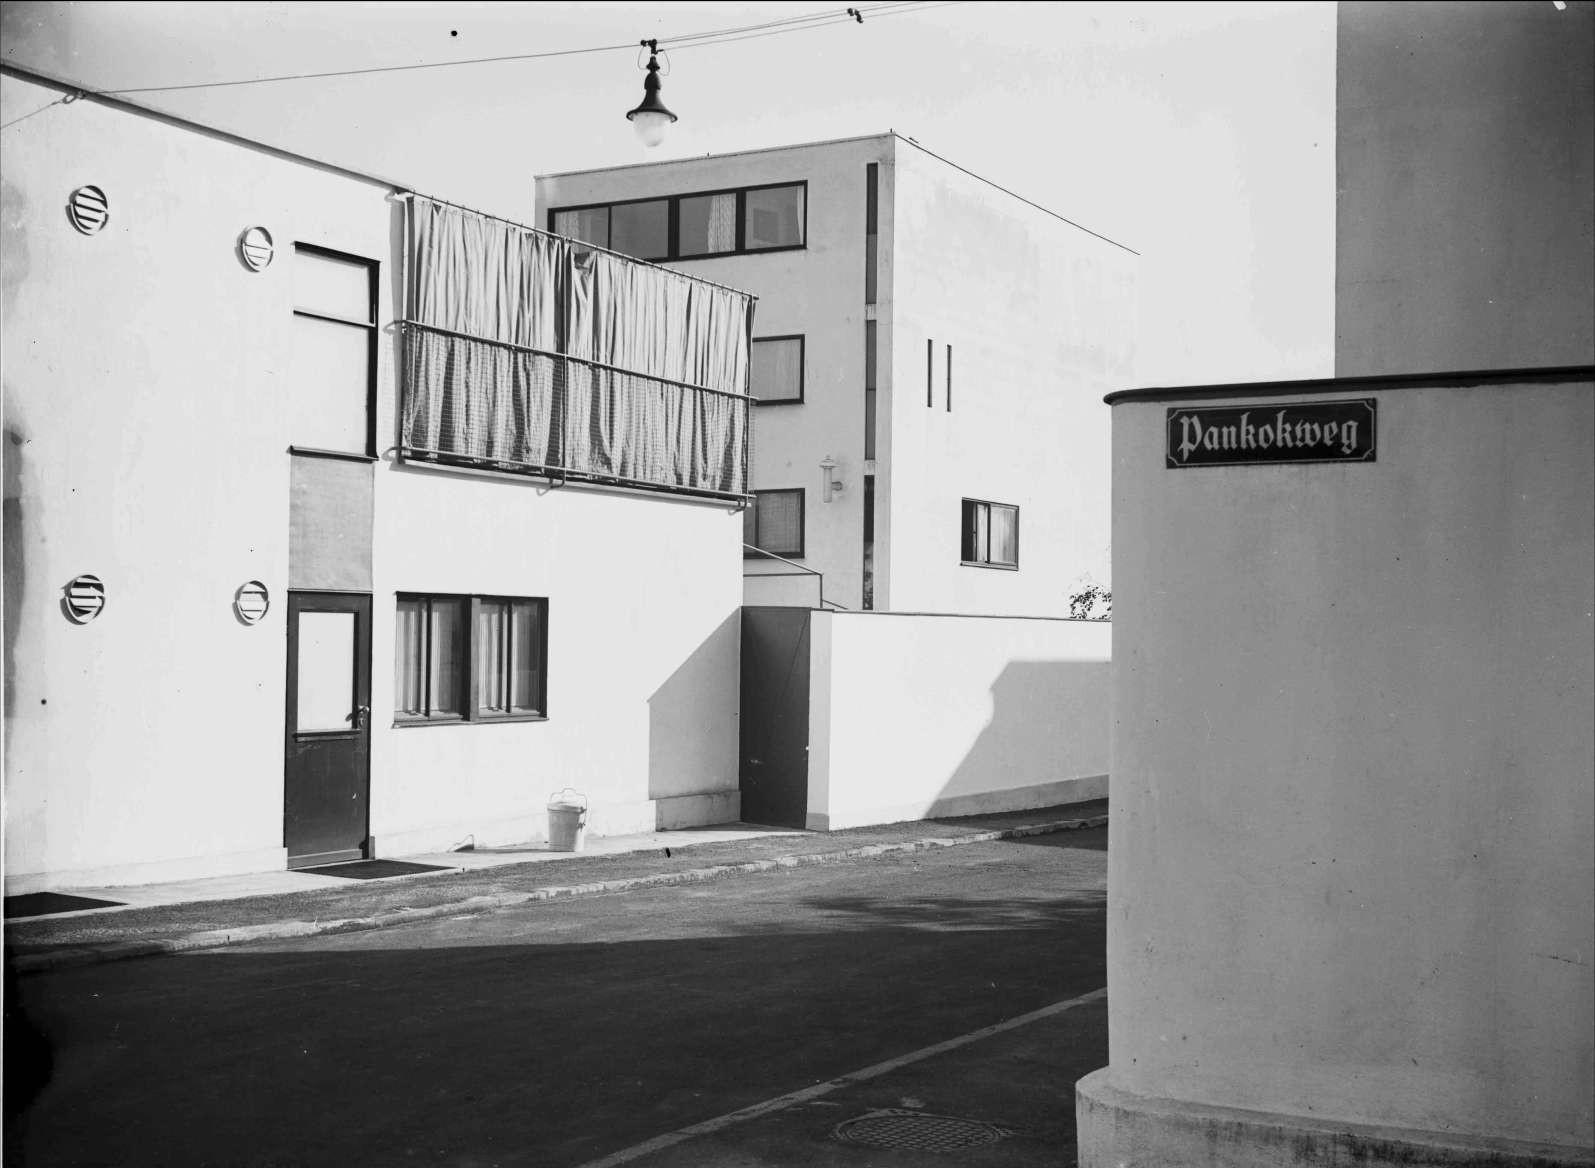 Weißenhofsiedlung- Pankokweg